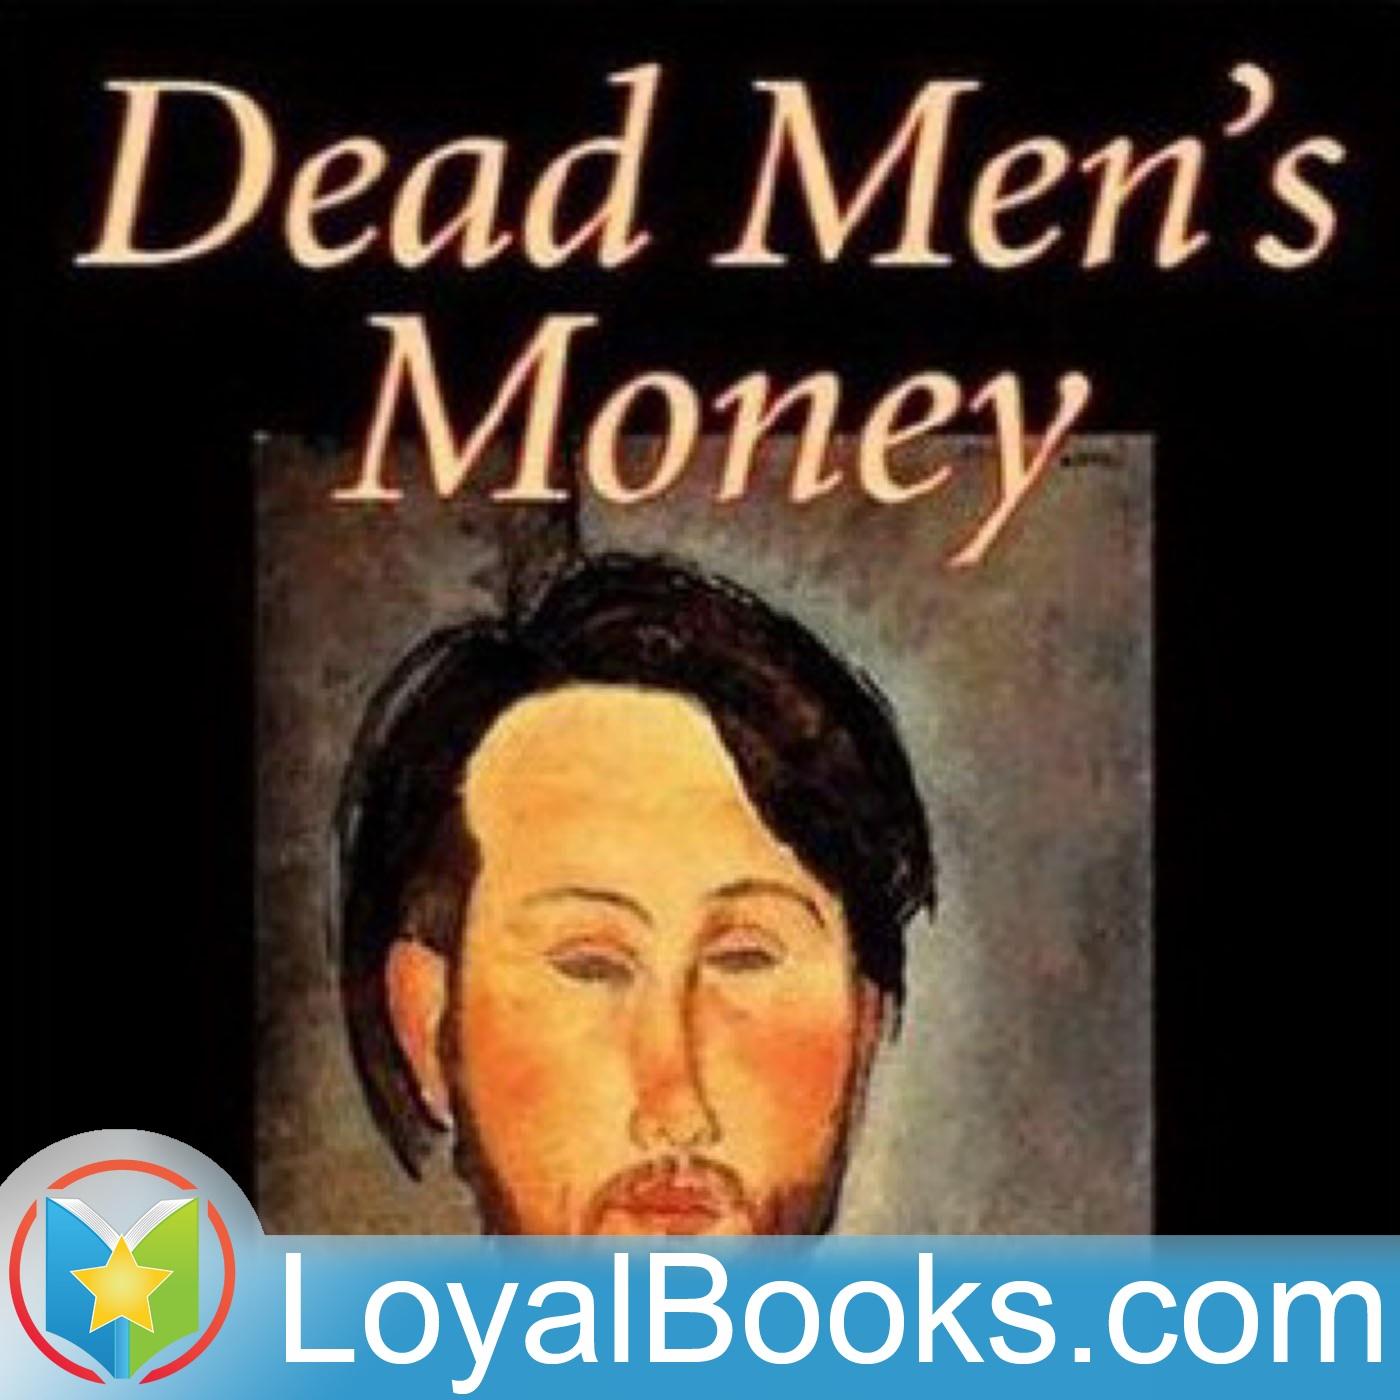 <![CDATA[Dead Men's Money by Joseph Smith Fletcher]]>